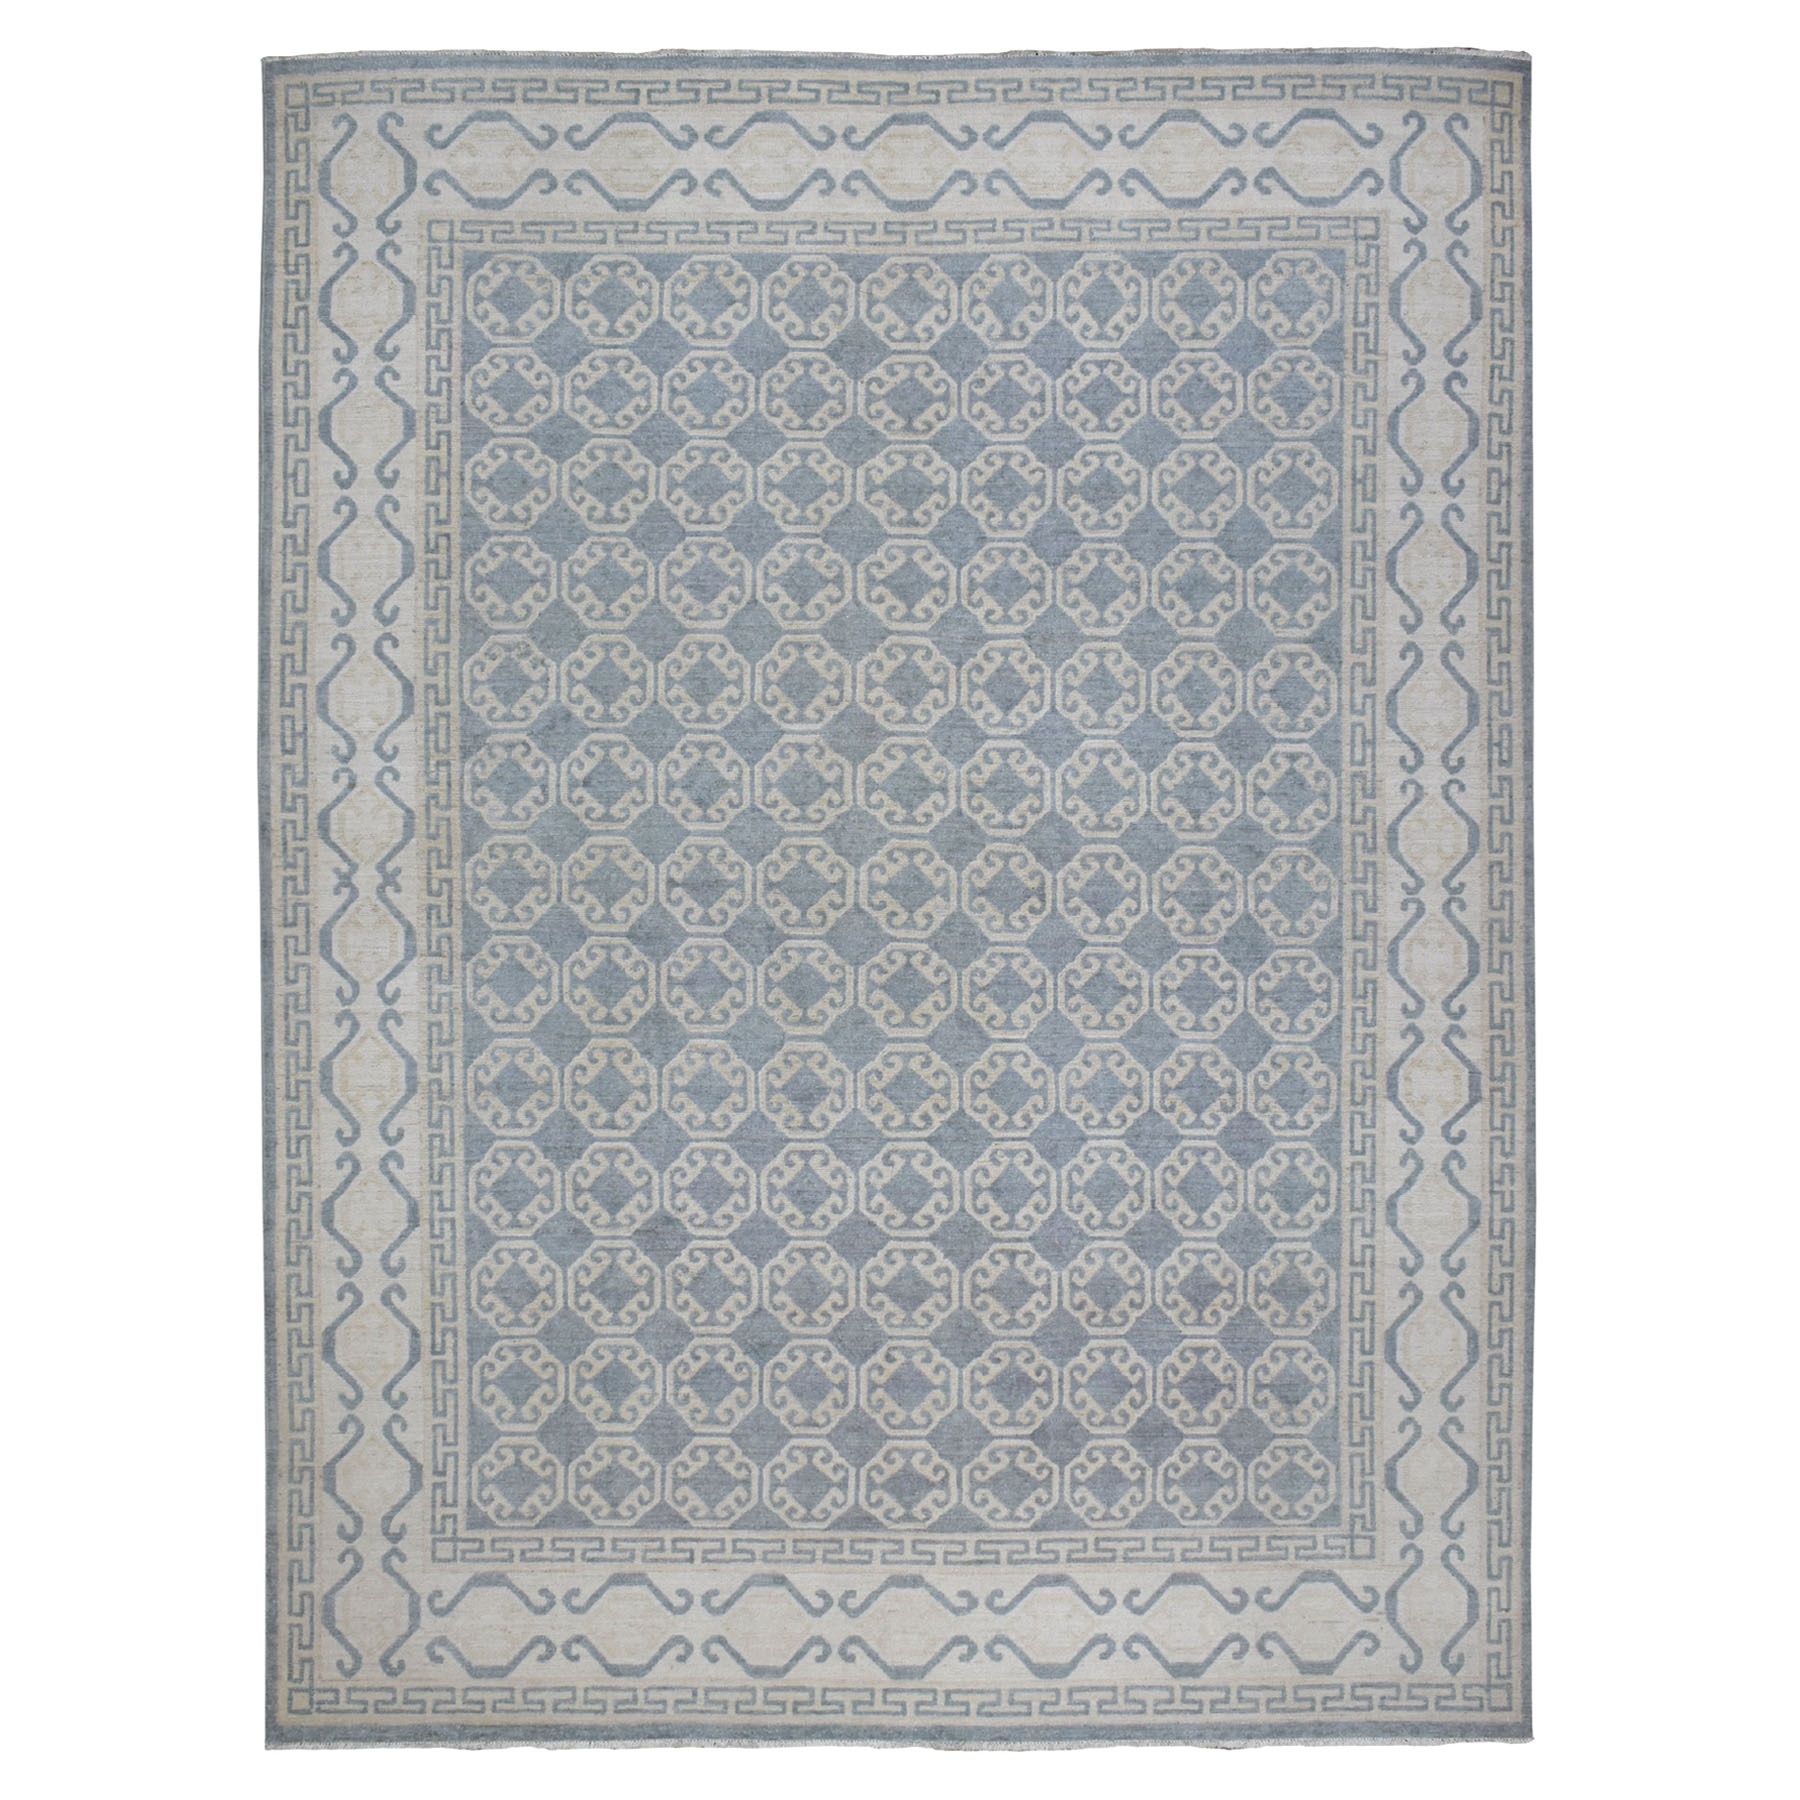 "8'9""X11'1"" White Wash Peshawar Khotan Design Pure Wool Hand Knotted Oriental Rug moaec967"